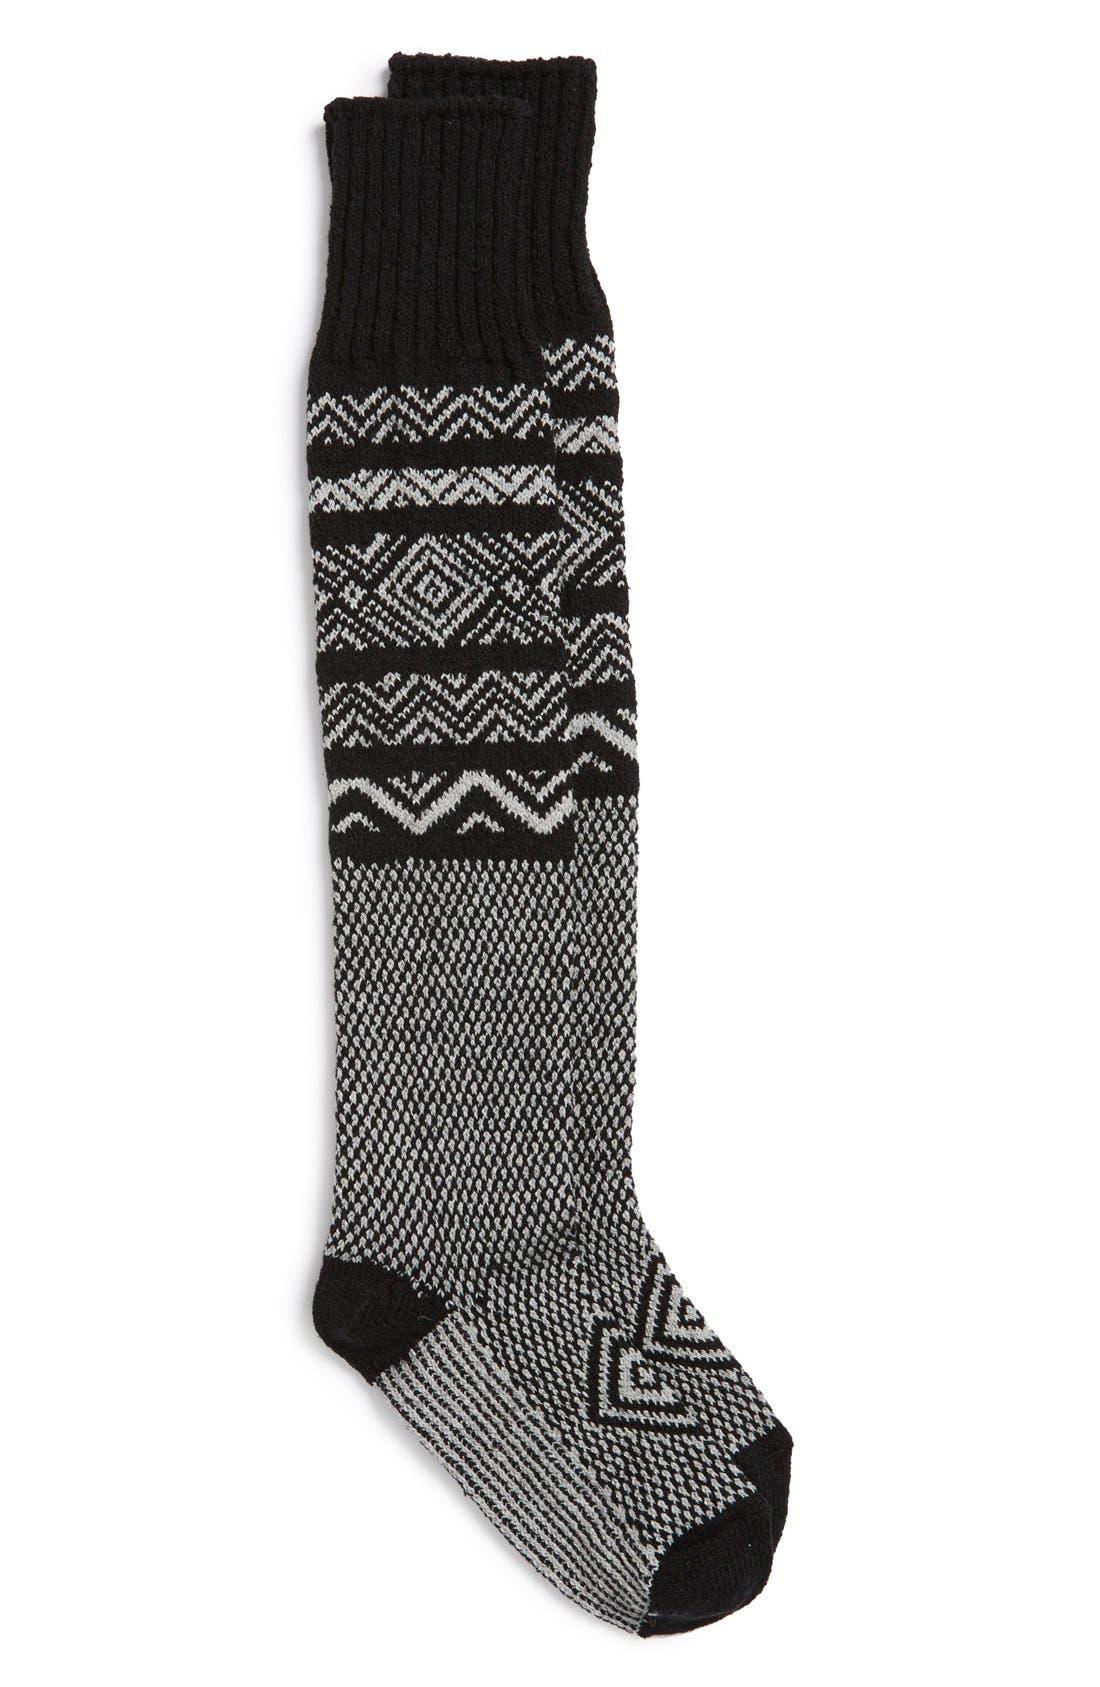 Main Image - Peony & Moss Scandinavian Knee High Socks